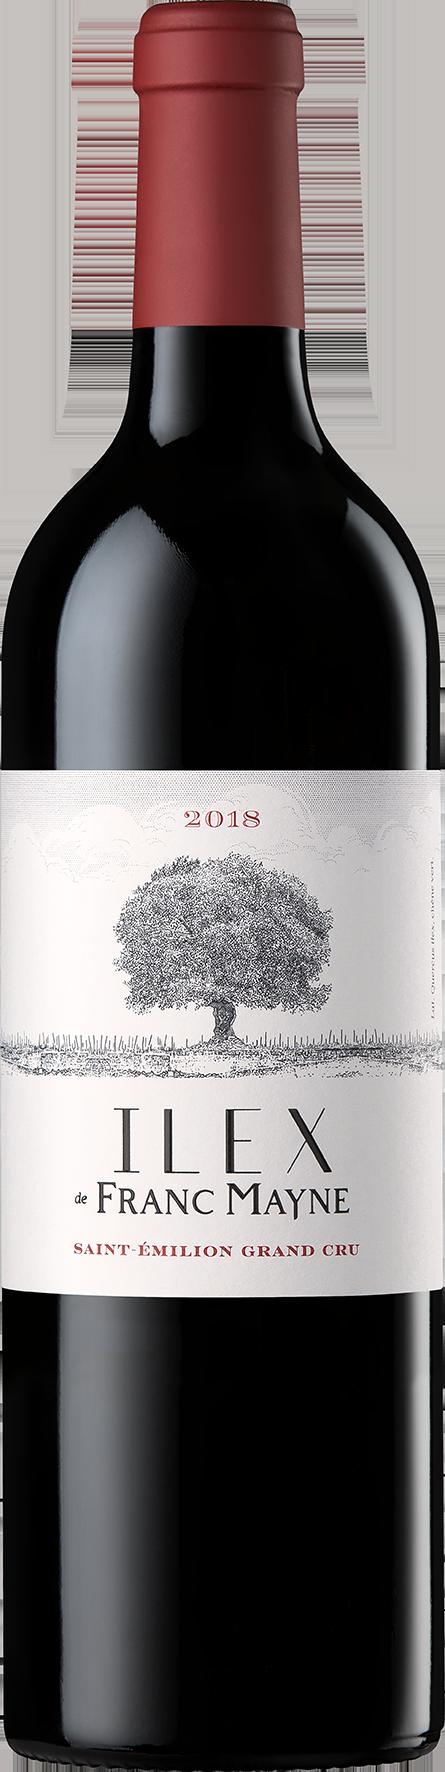 Ilex de Franc Mayne 2018 - Grand cru classé Saint-Emilion - Château Franc Mayne